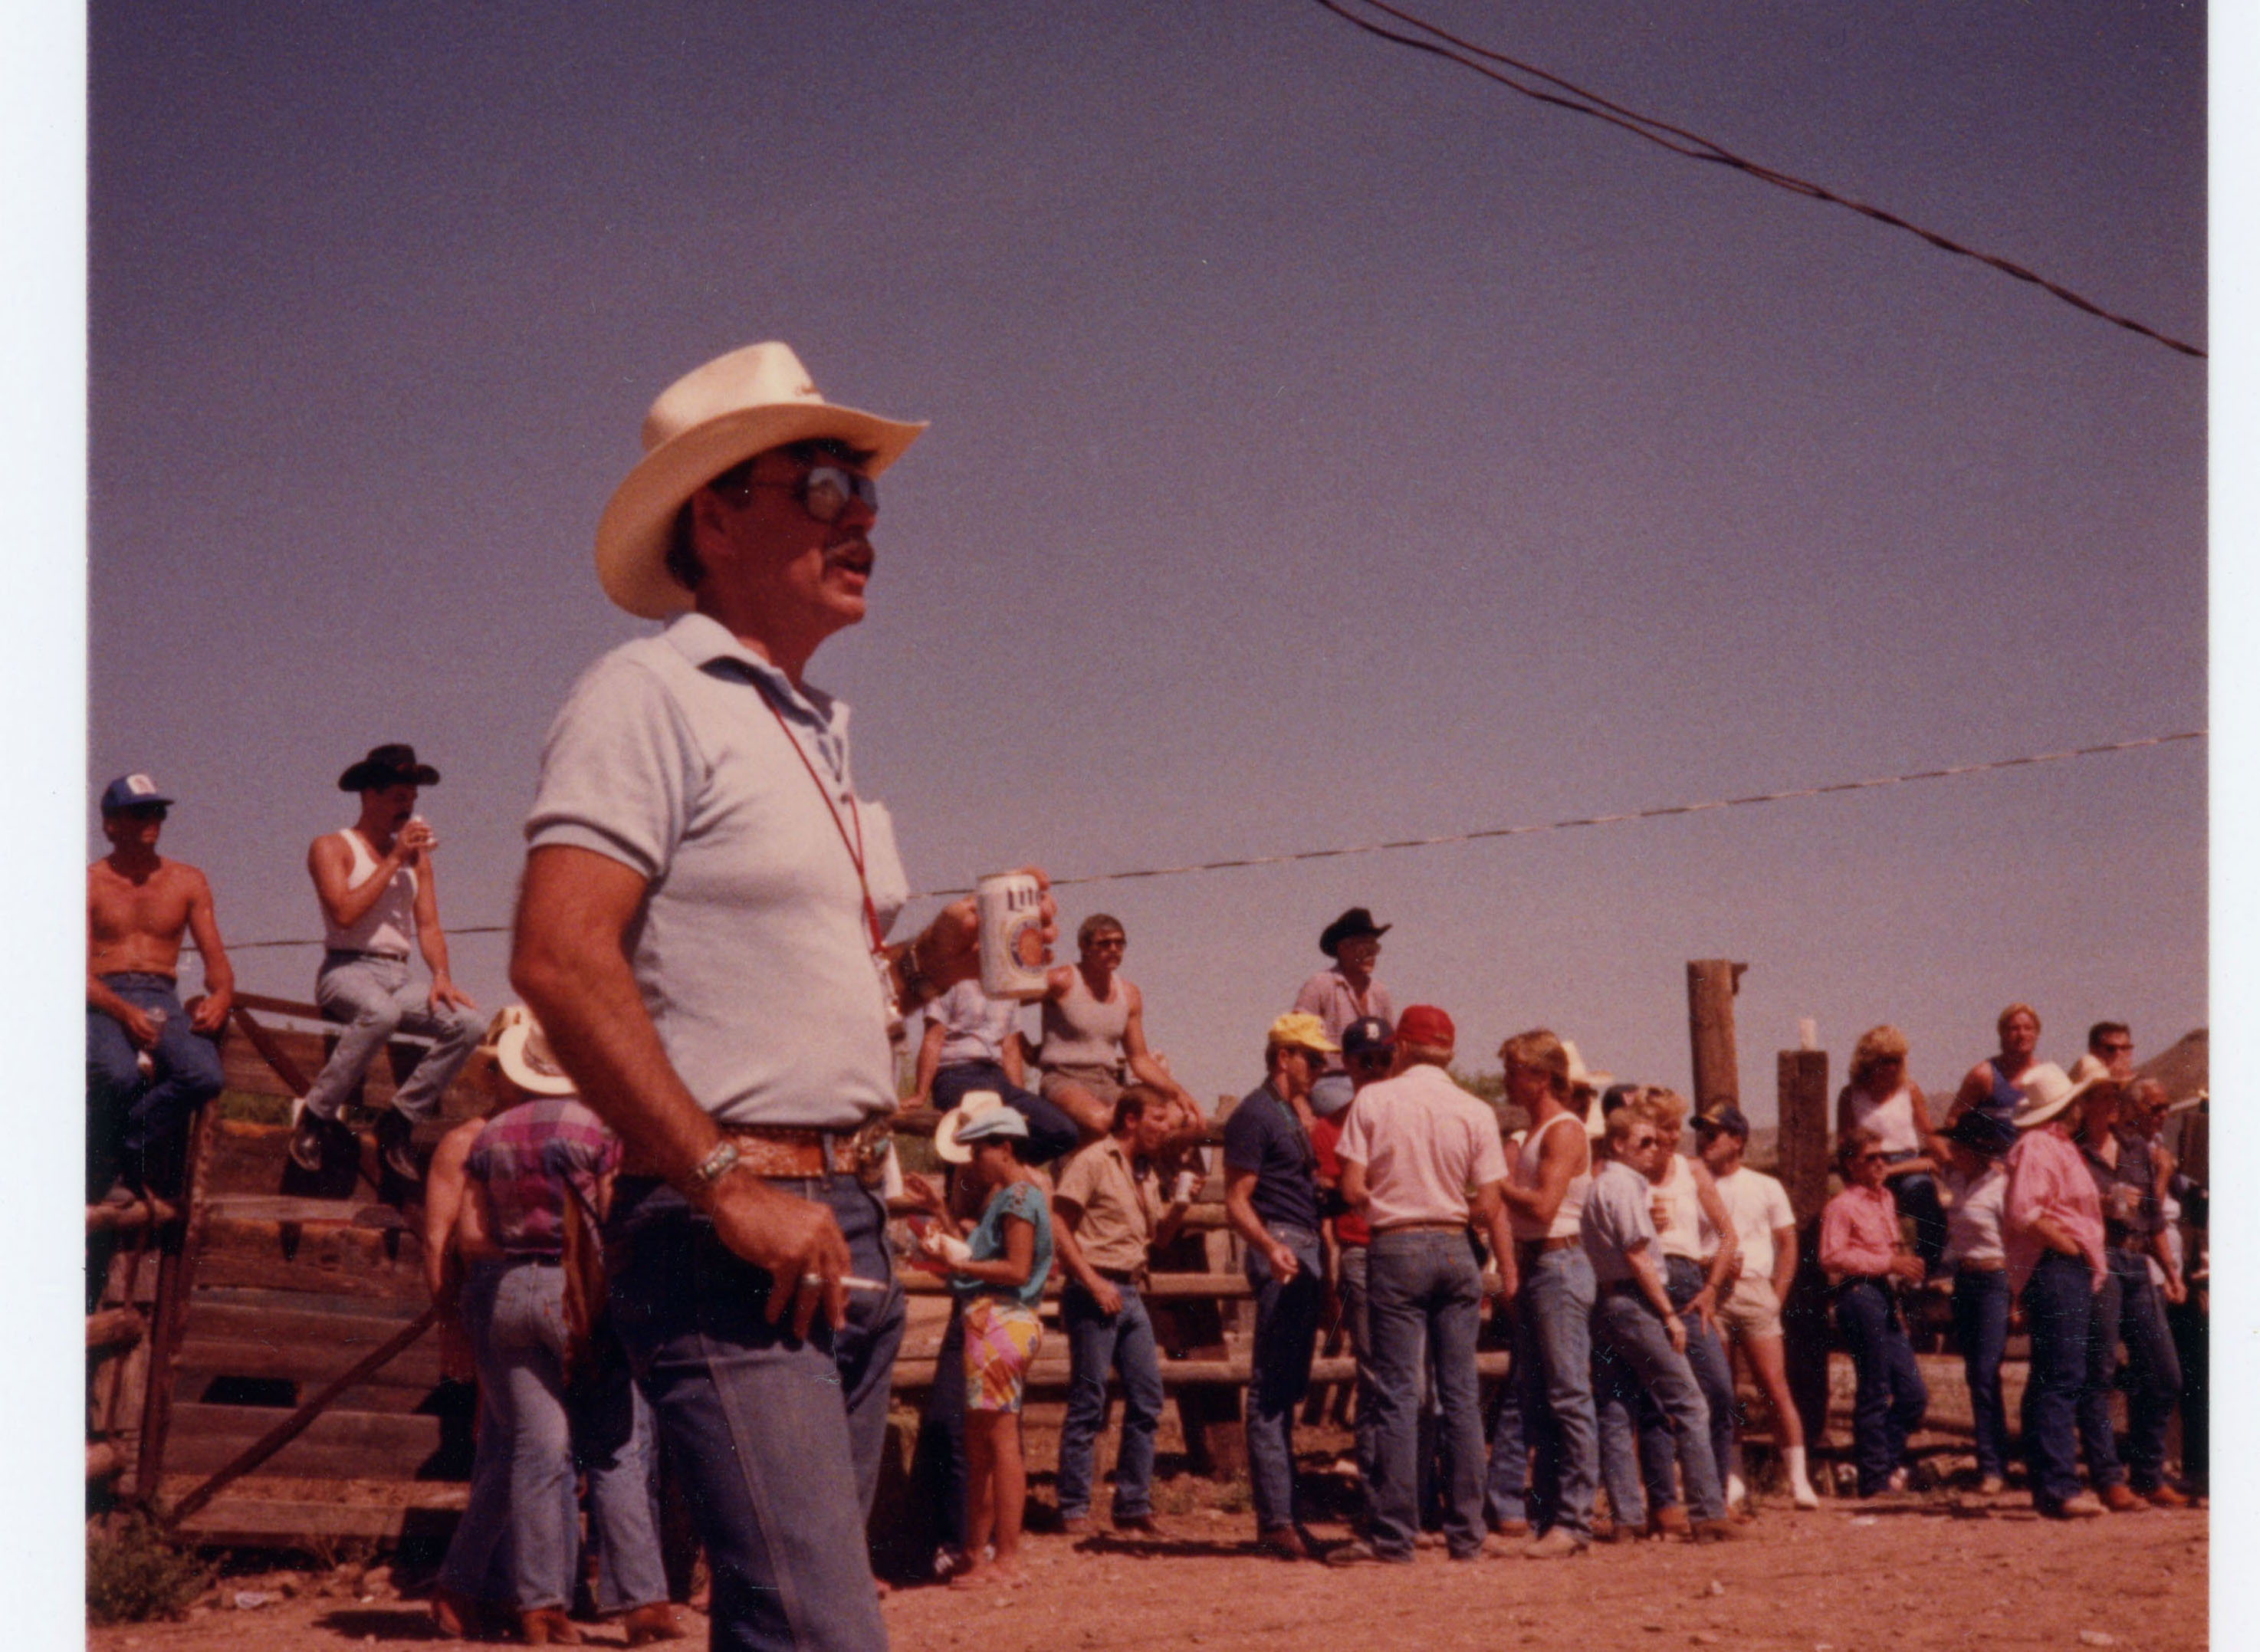 Man at rodeo; Arizona Gay Rodeo Association; 1986